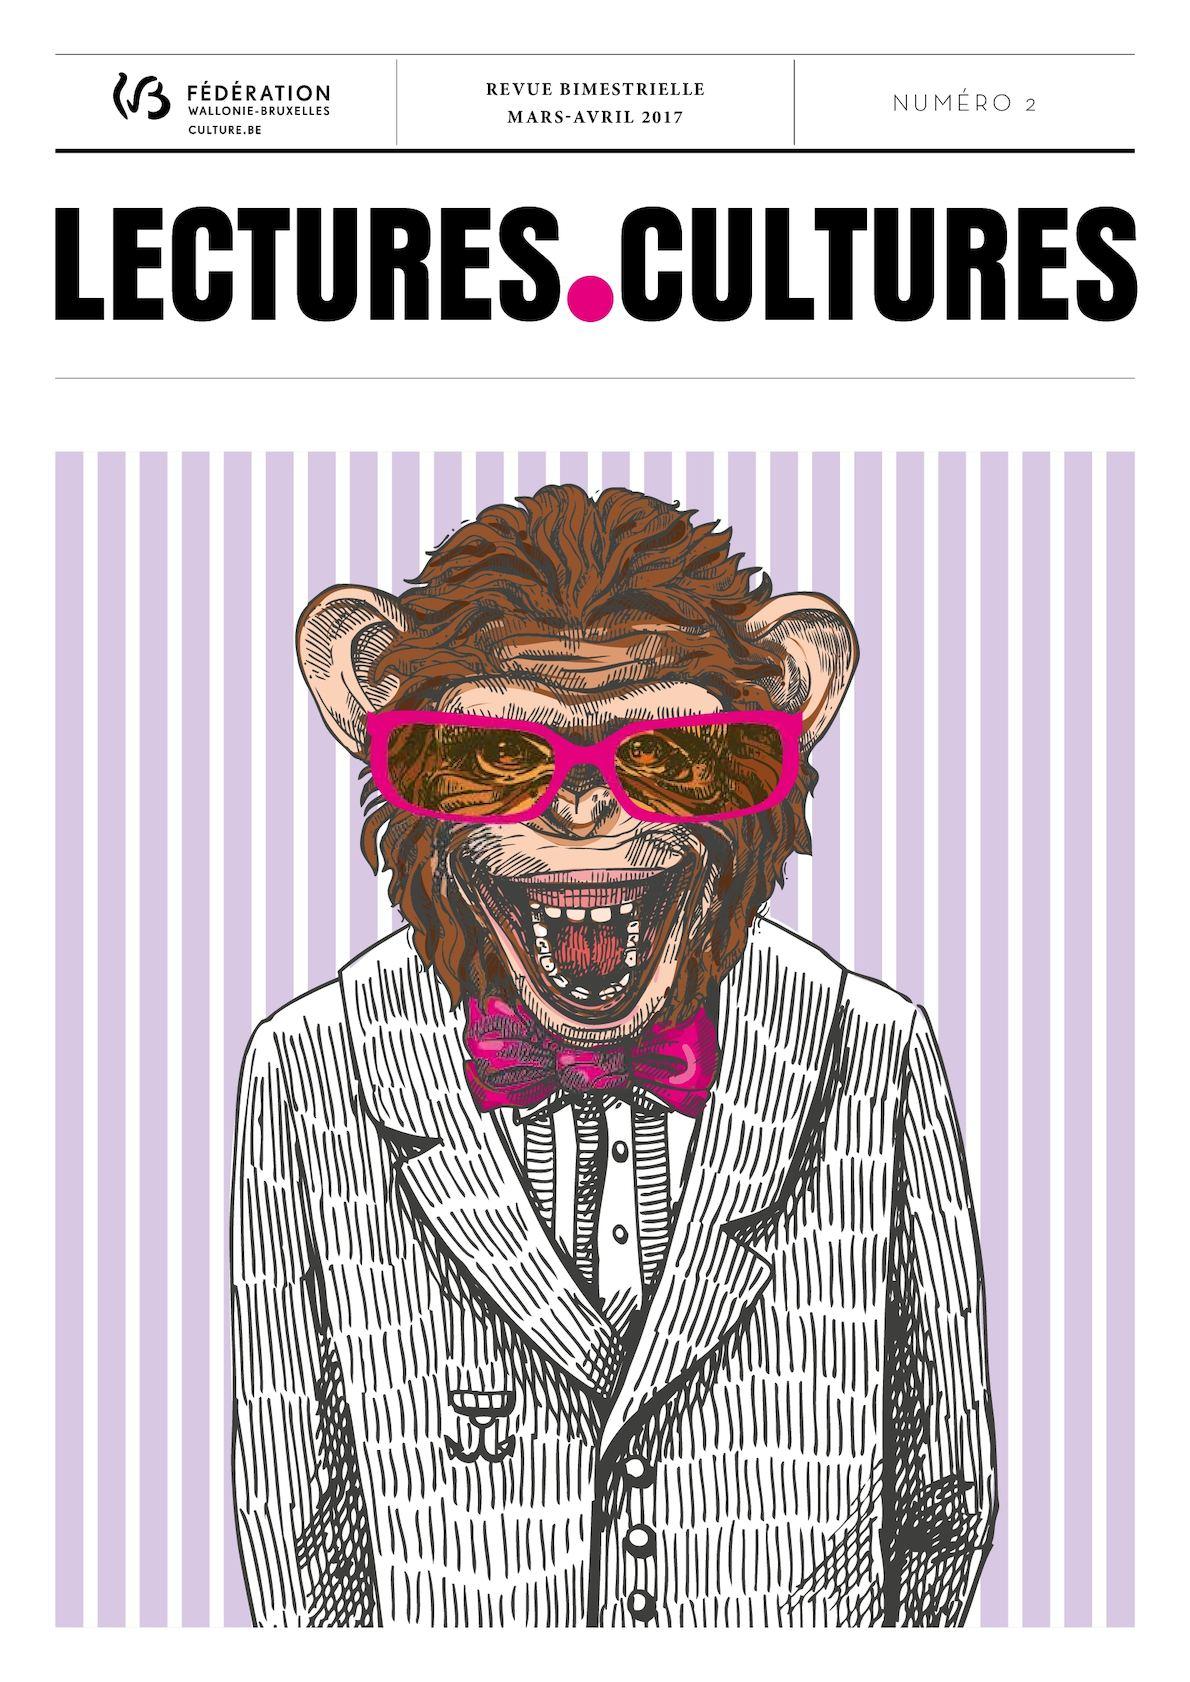 Calaméo - Lectures.Cultures n°2 (mars-avril 2017) b72c6ab32d3